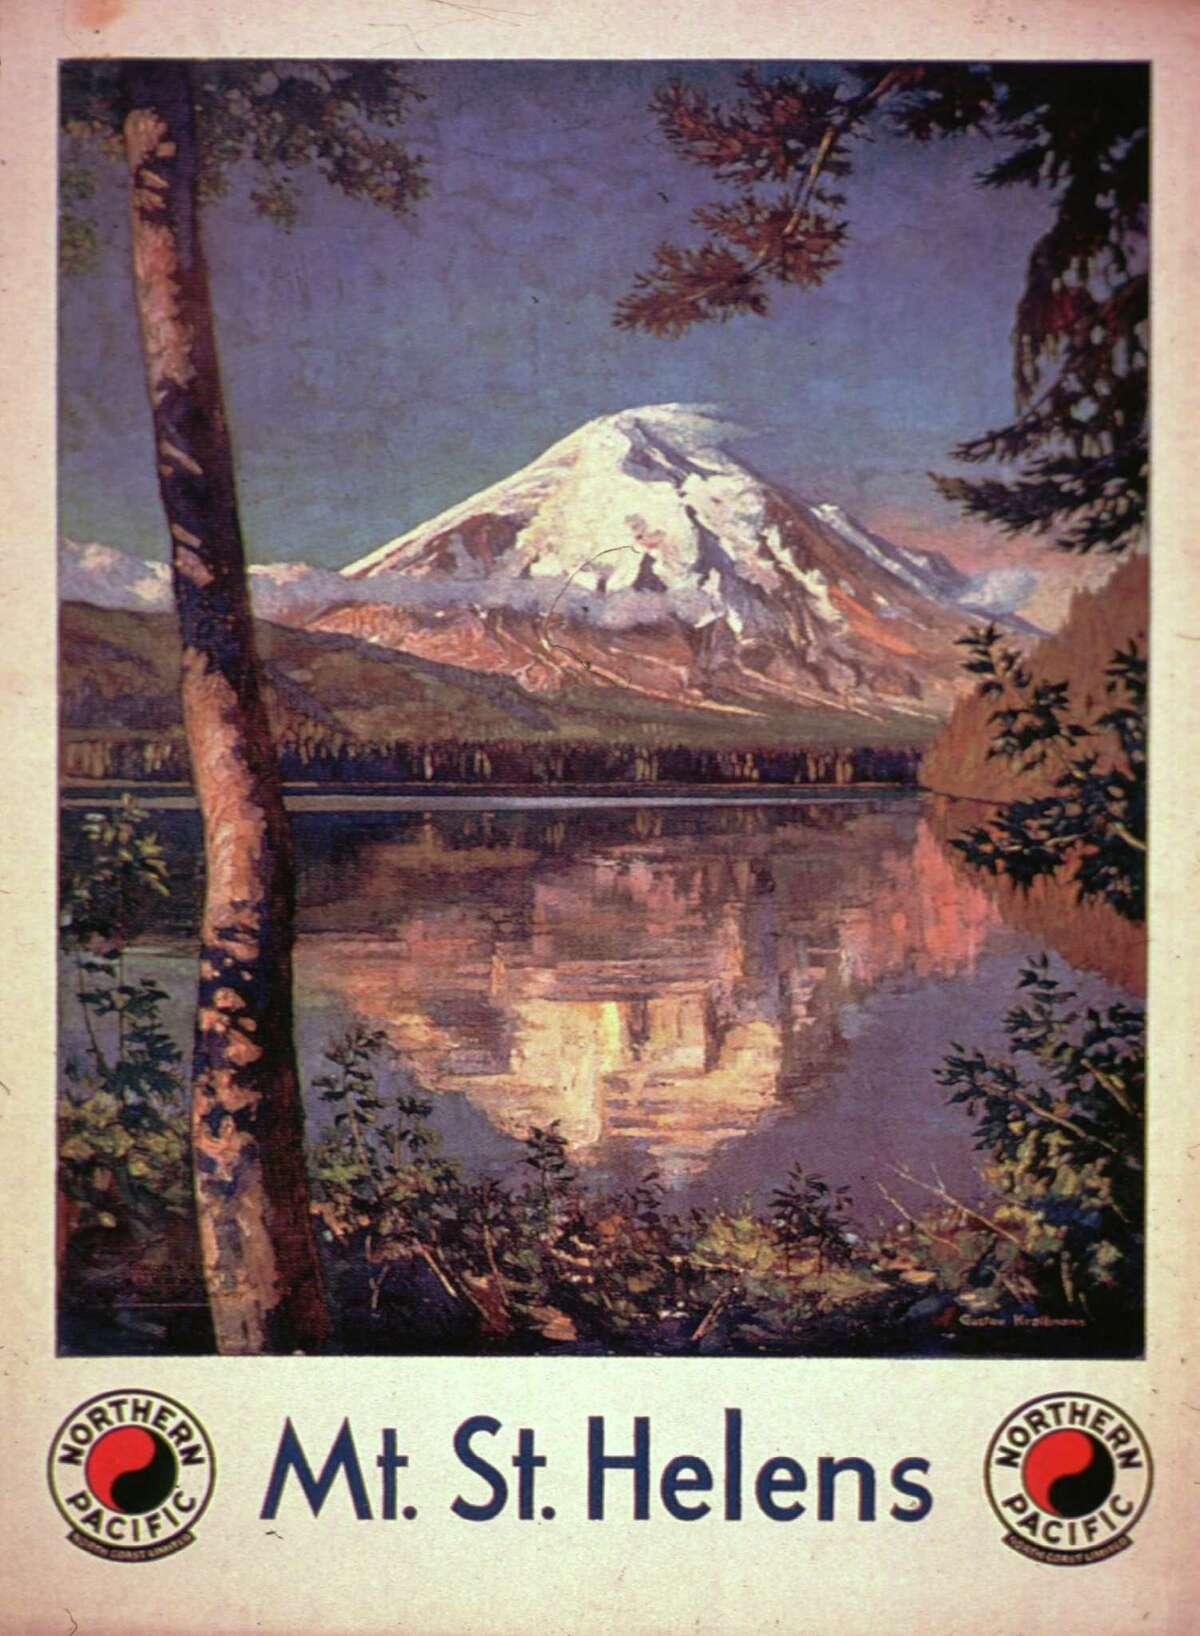 1929: The snow-capped peak of Mount St. Helens, an active volcano in the Cascade Range, Washington State. Original Artist: By Gustav Krollmann.